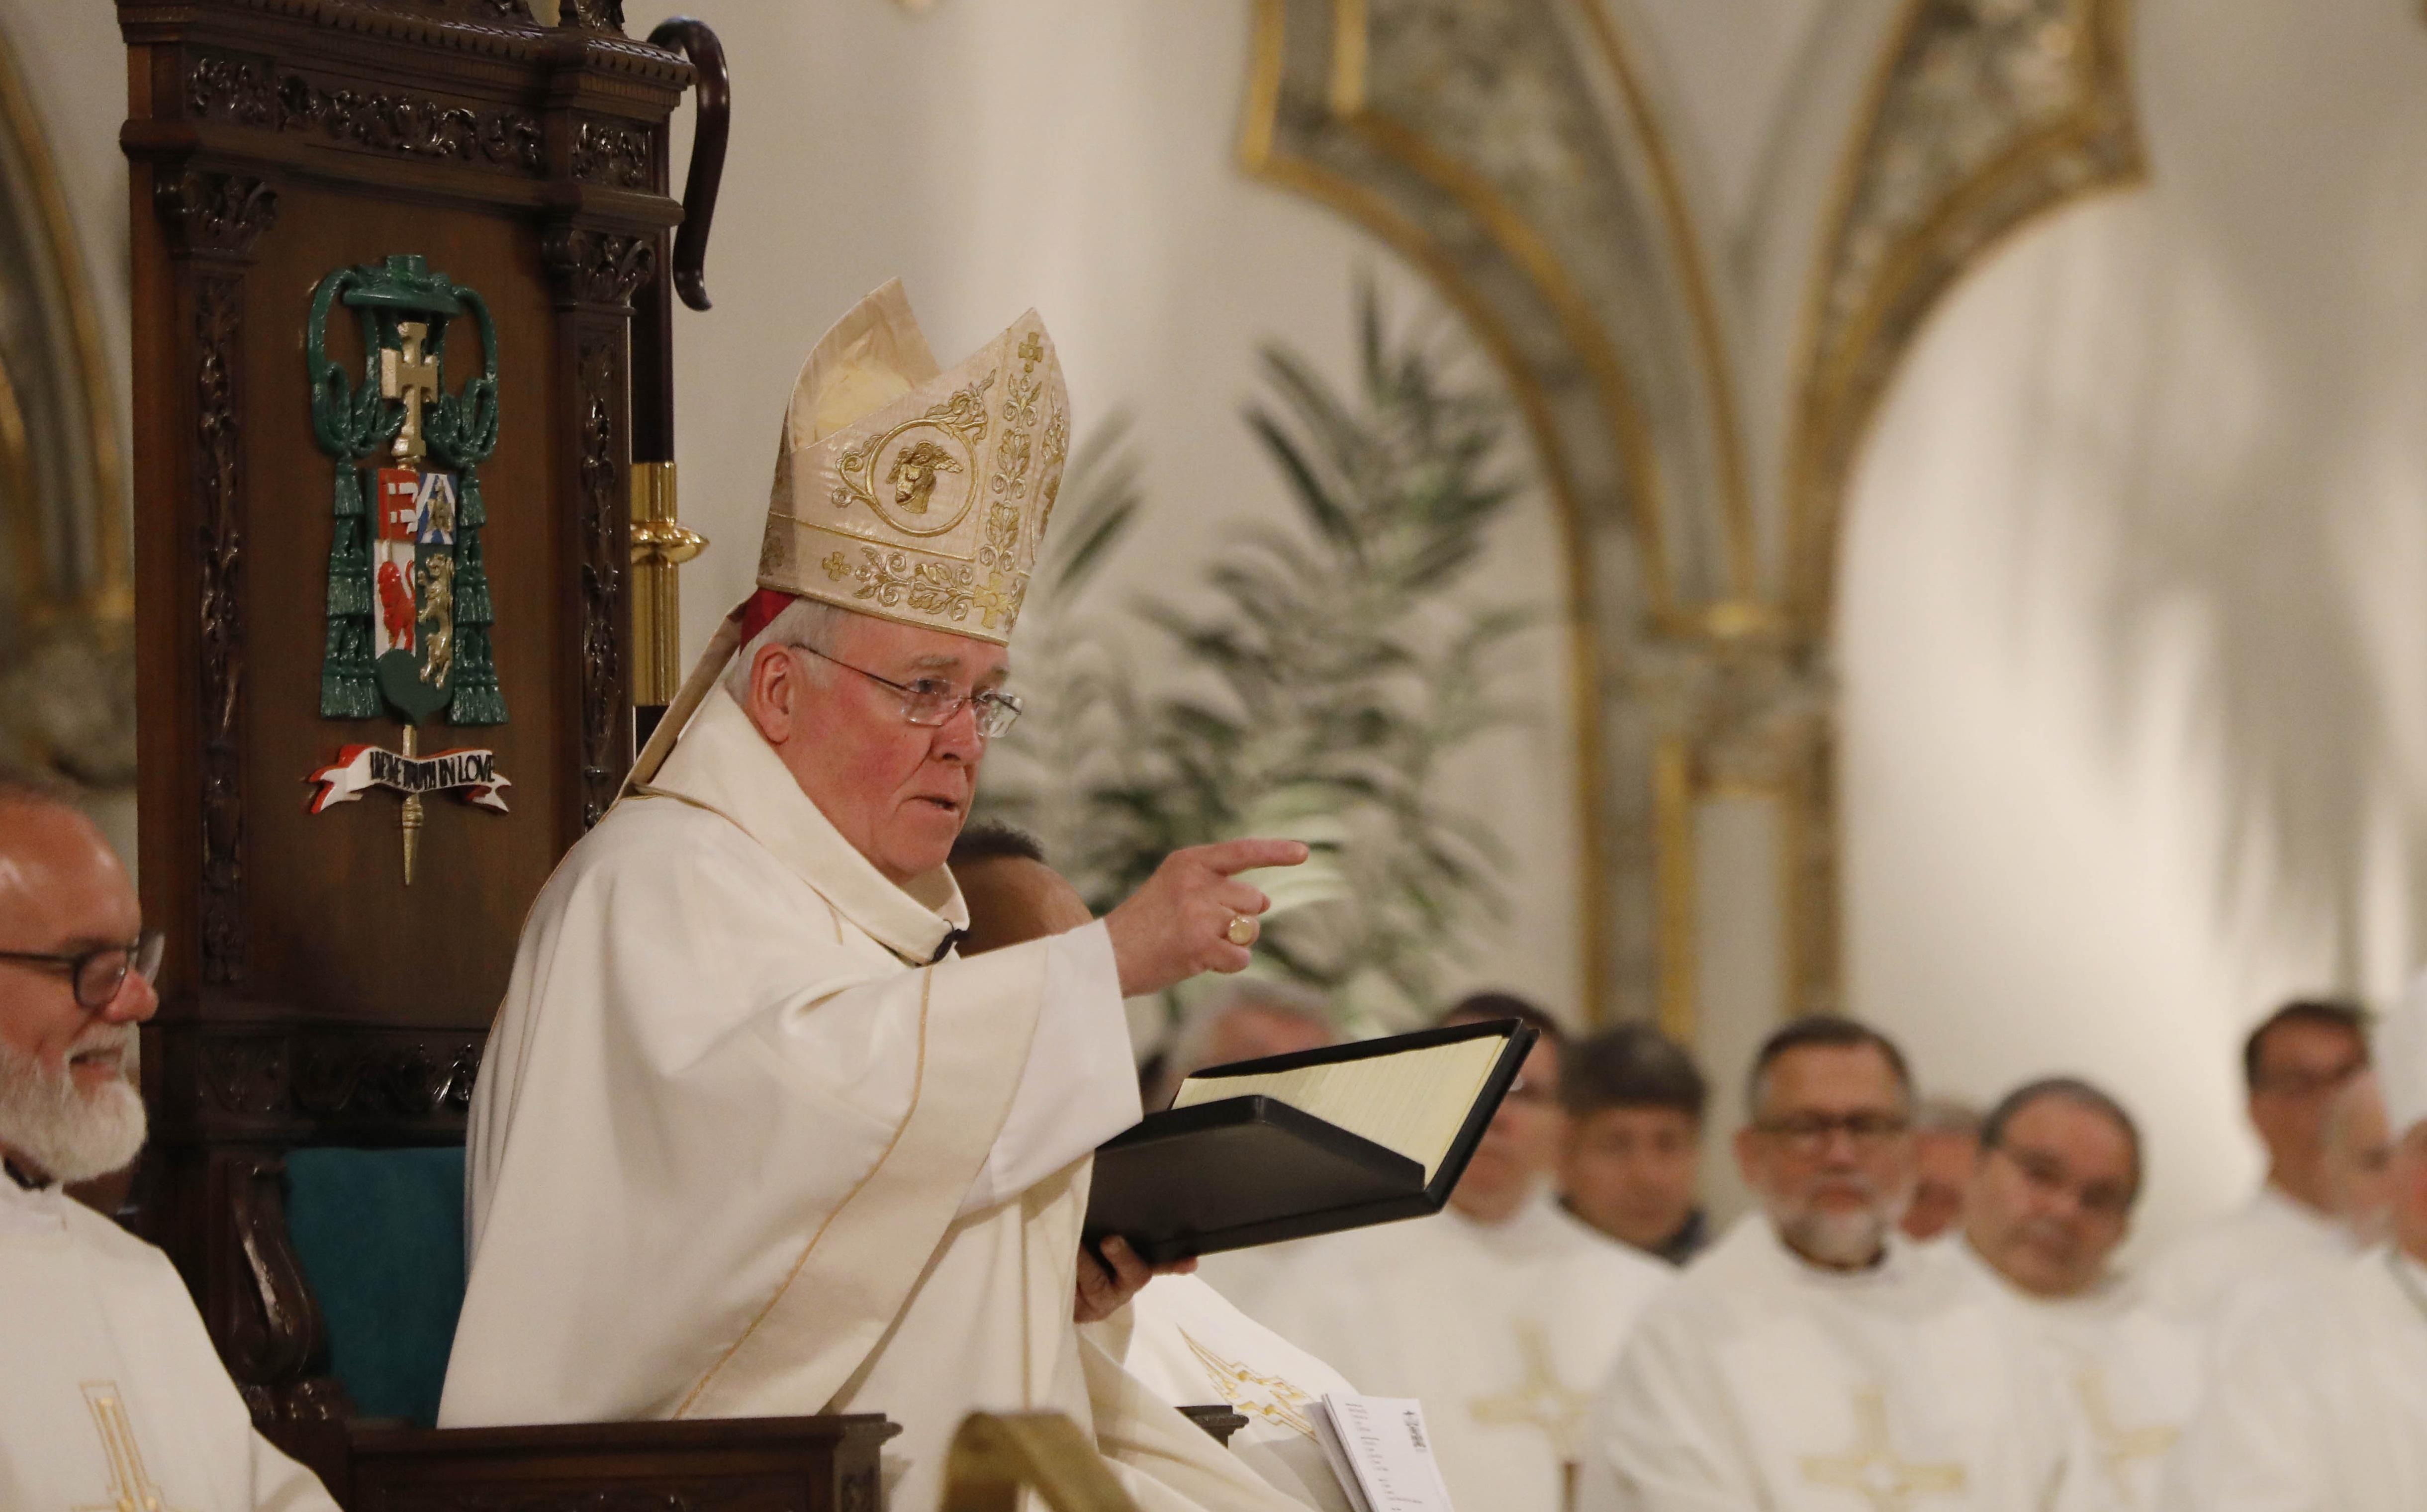 editorial  bishop malone should resign  u2013 the buffalo news